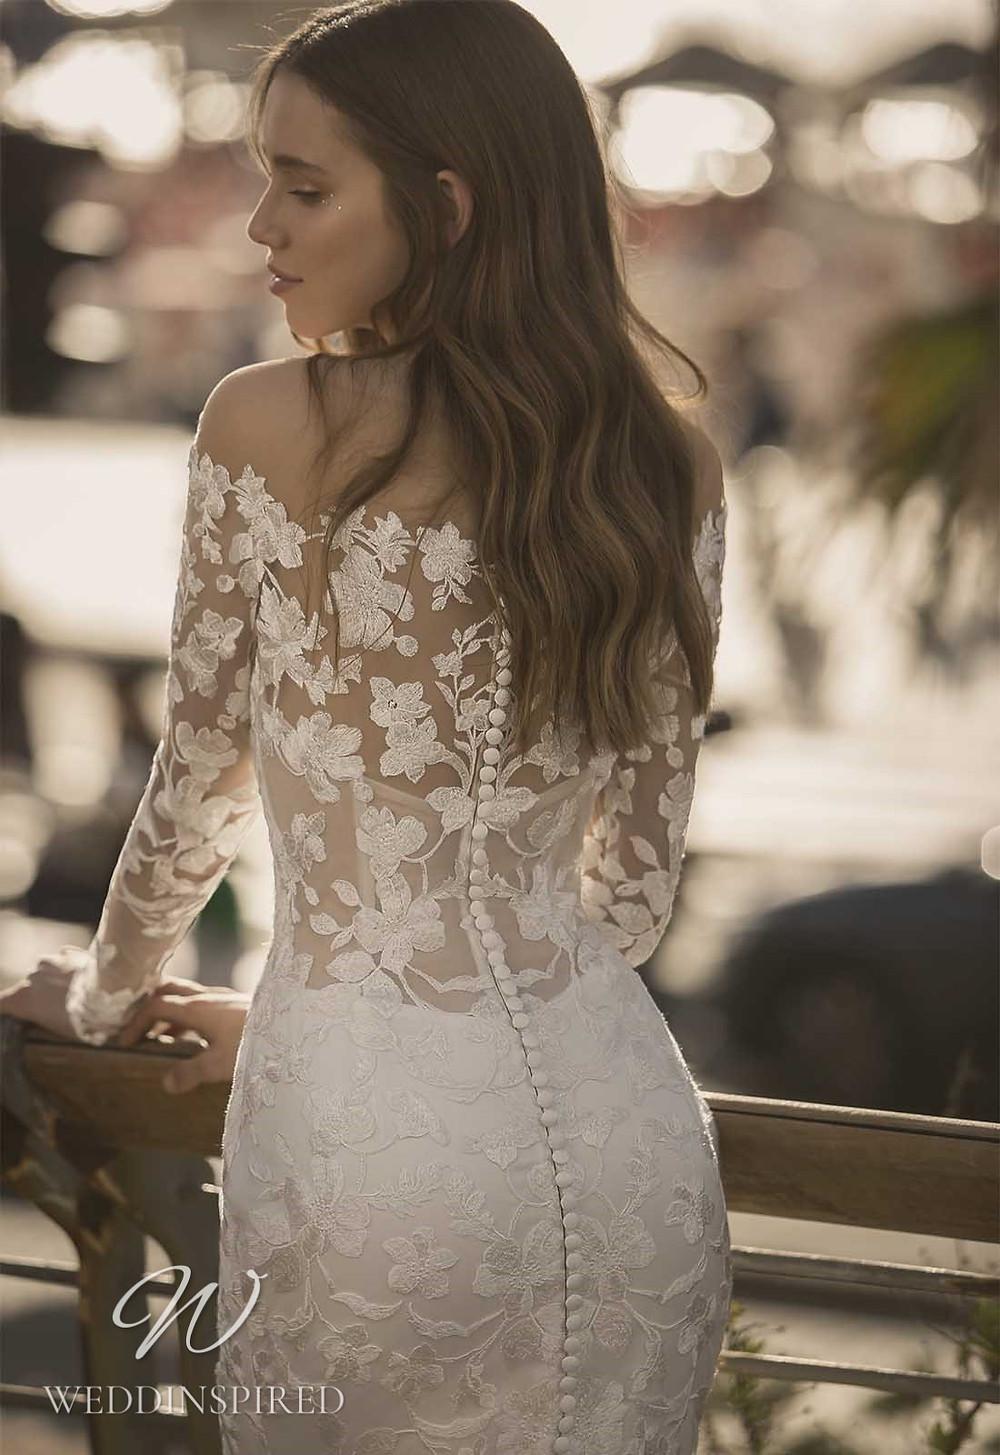 A Pnina Tornai 2021 off the shoulder lace mermaid wedding dress